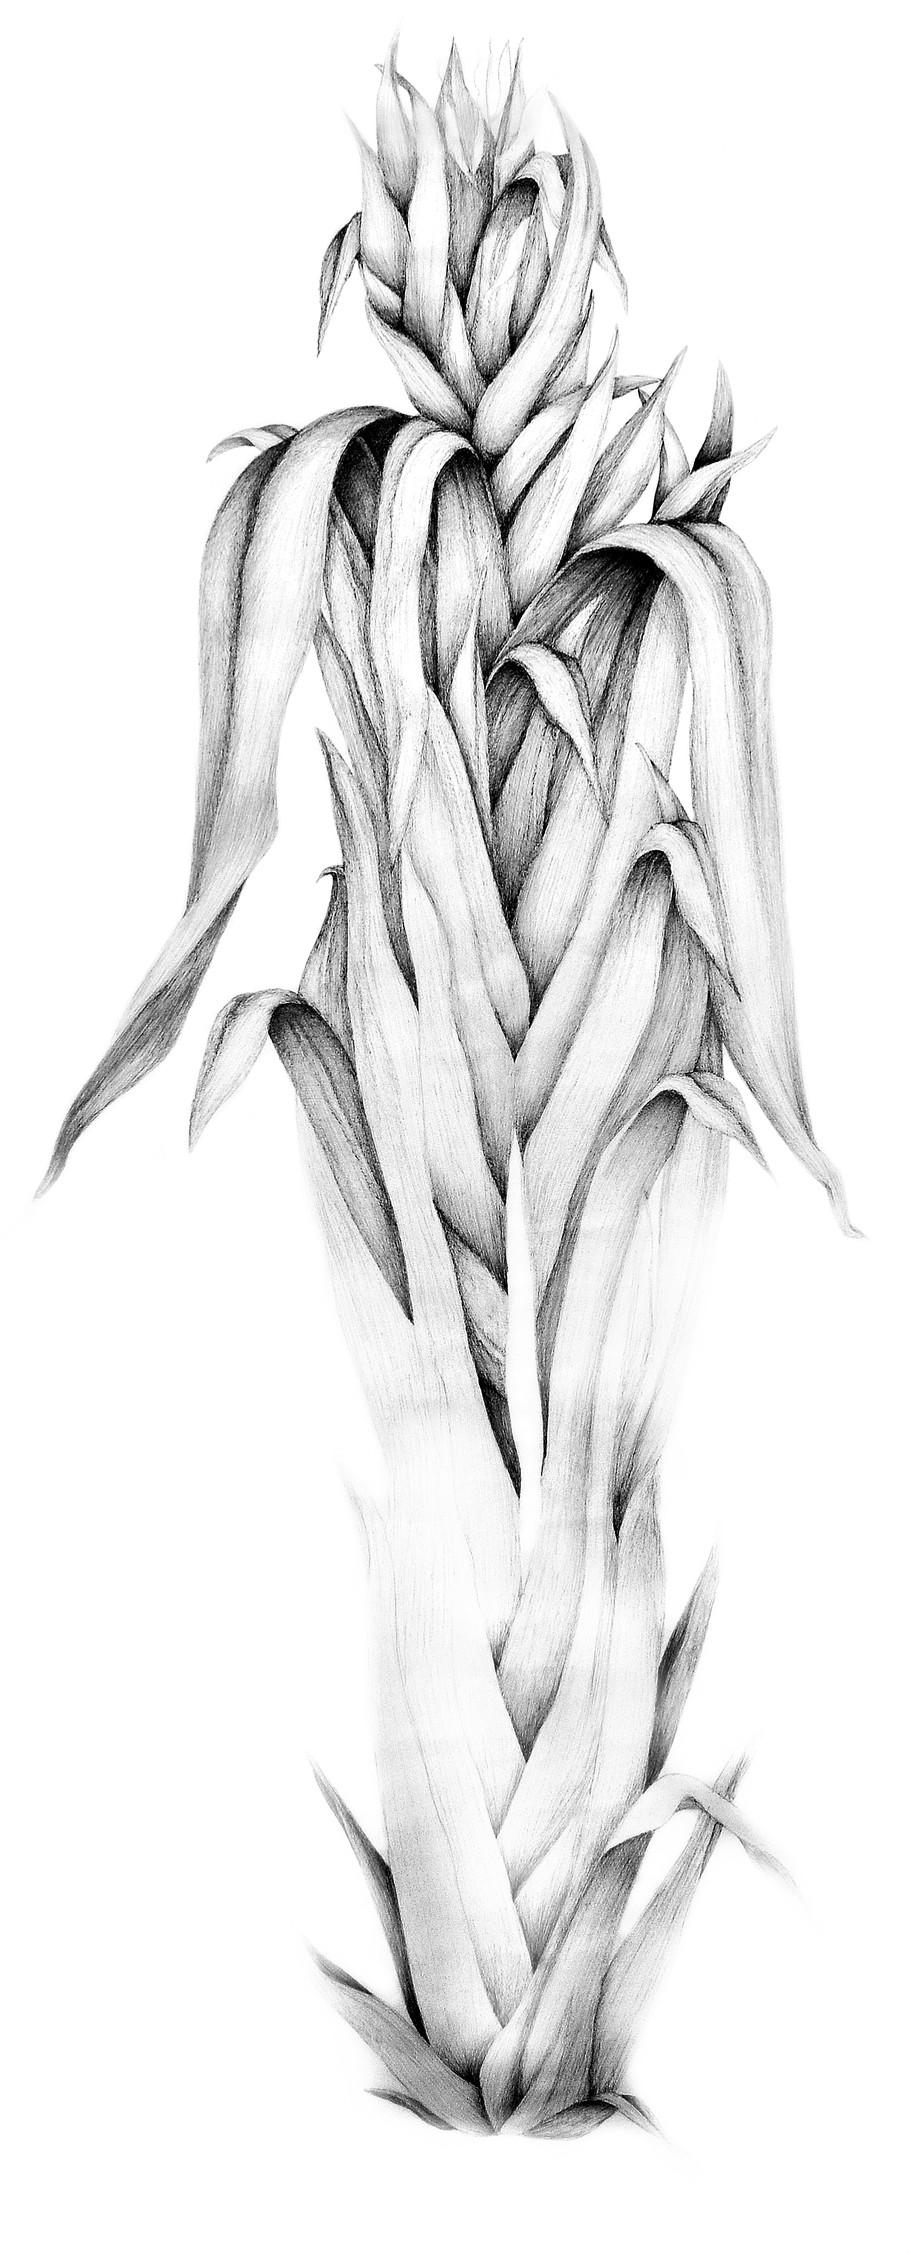 autoportrait phormium tenax RRR.jpg